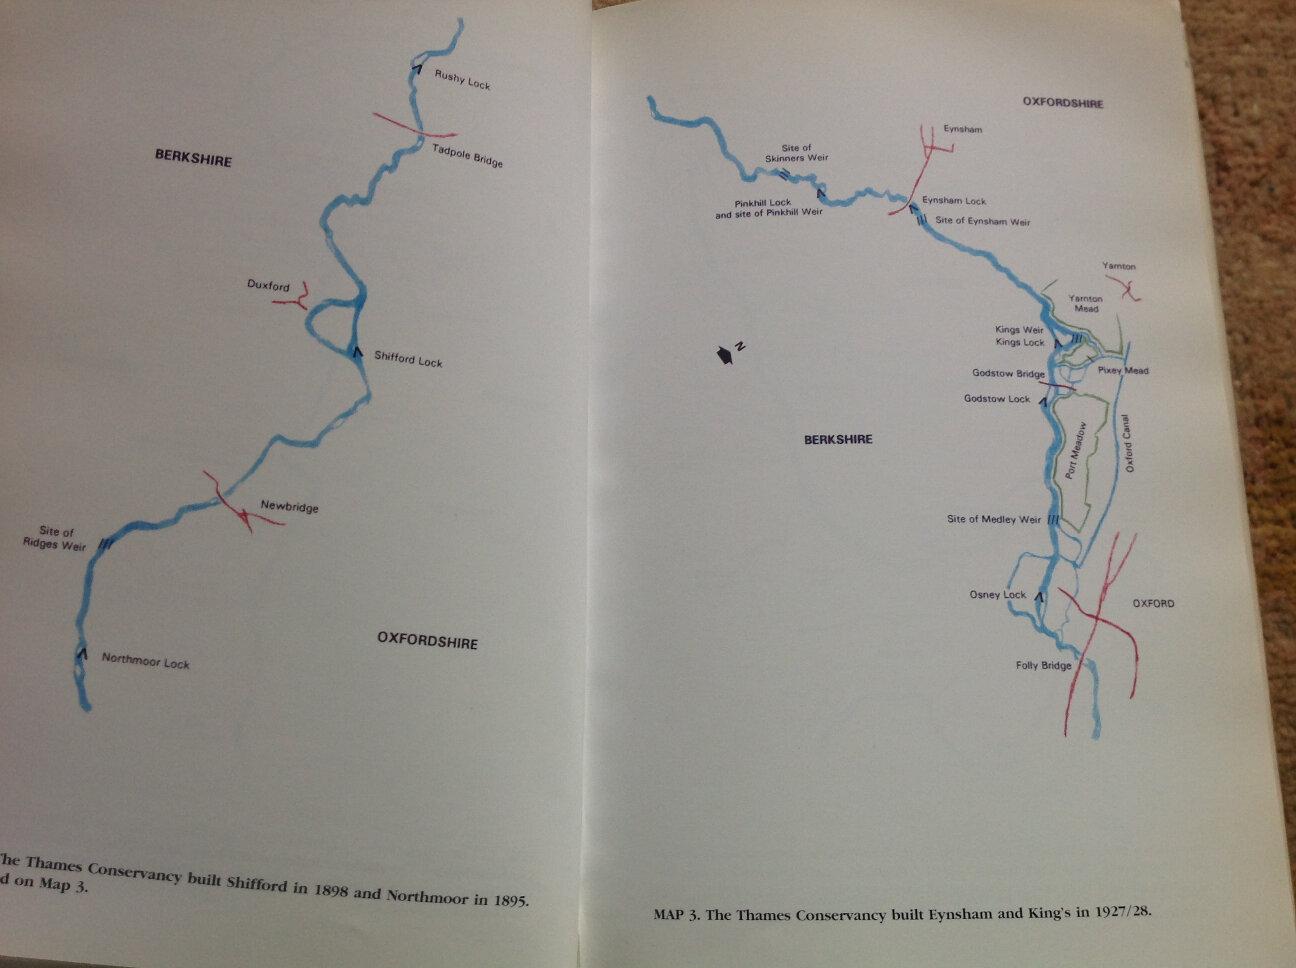 Newbridge to Oxford (36)